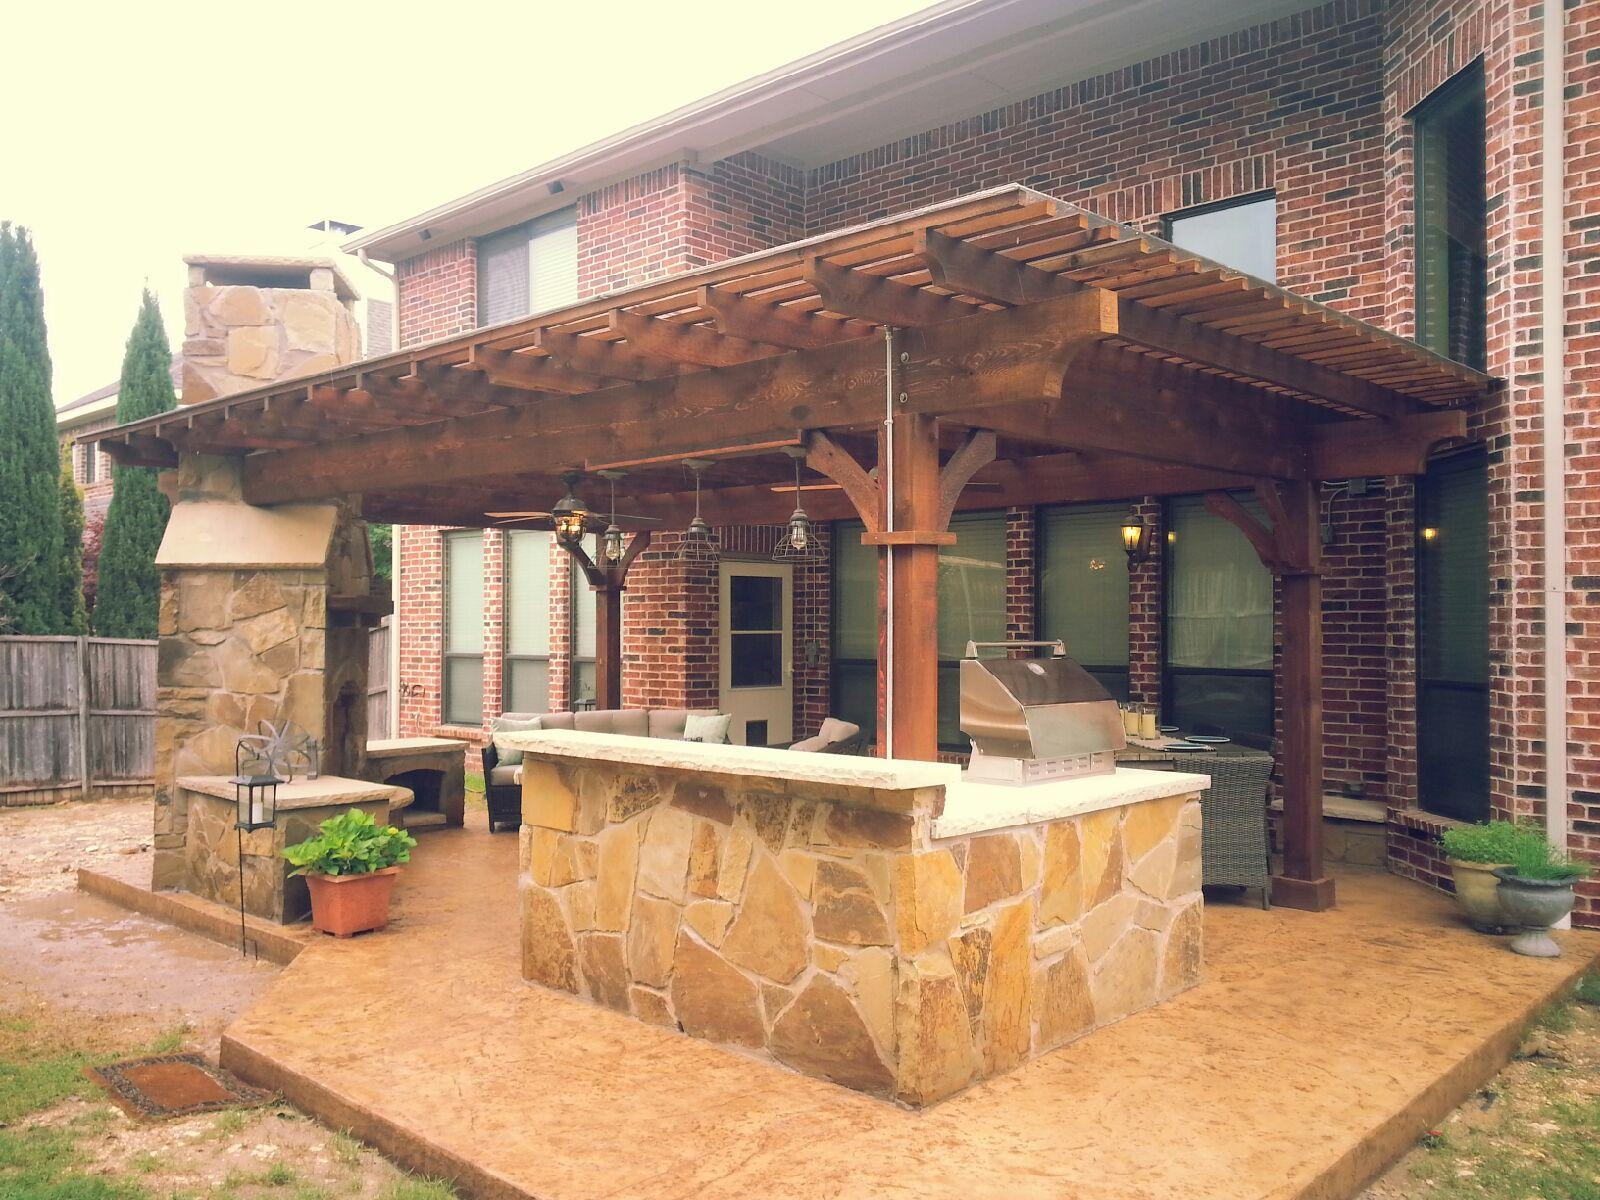 Outdoor Living Frisco Tx Texas Traditions Outdoors Pergola And Outdoor Kitchen Patio Courtyard Ideas Patio Projects Backyard Pergola